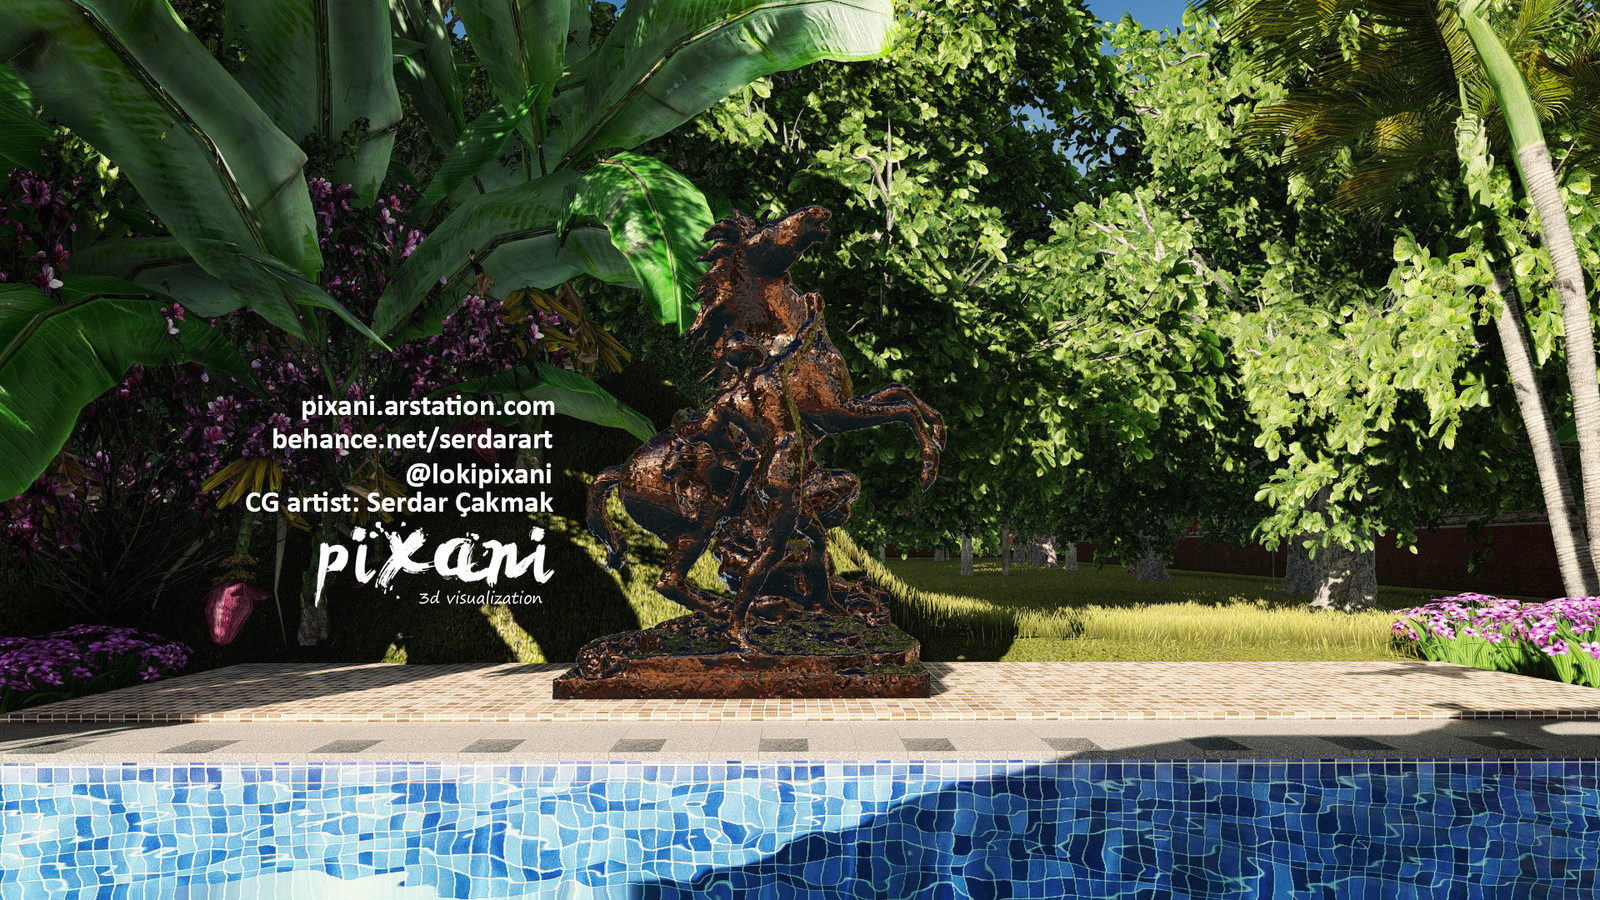 Venend Home pixani 3d visualization  ARTSTATION https://pixani.artstation.com/ BEHANCE https://www.behance.net/serdarart